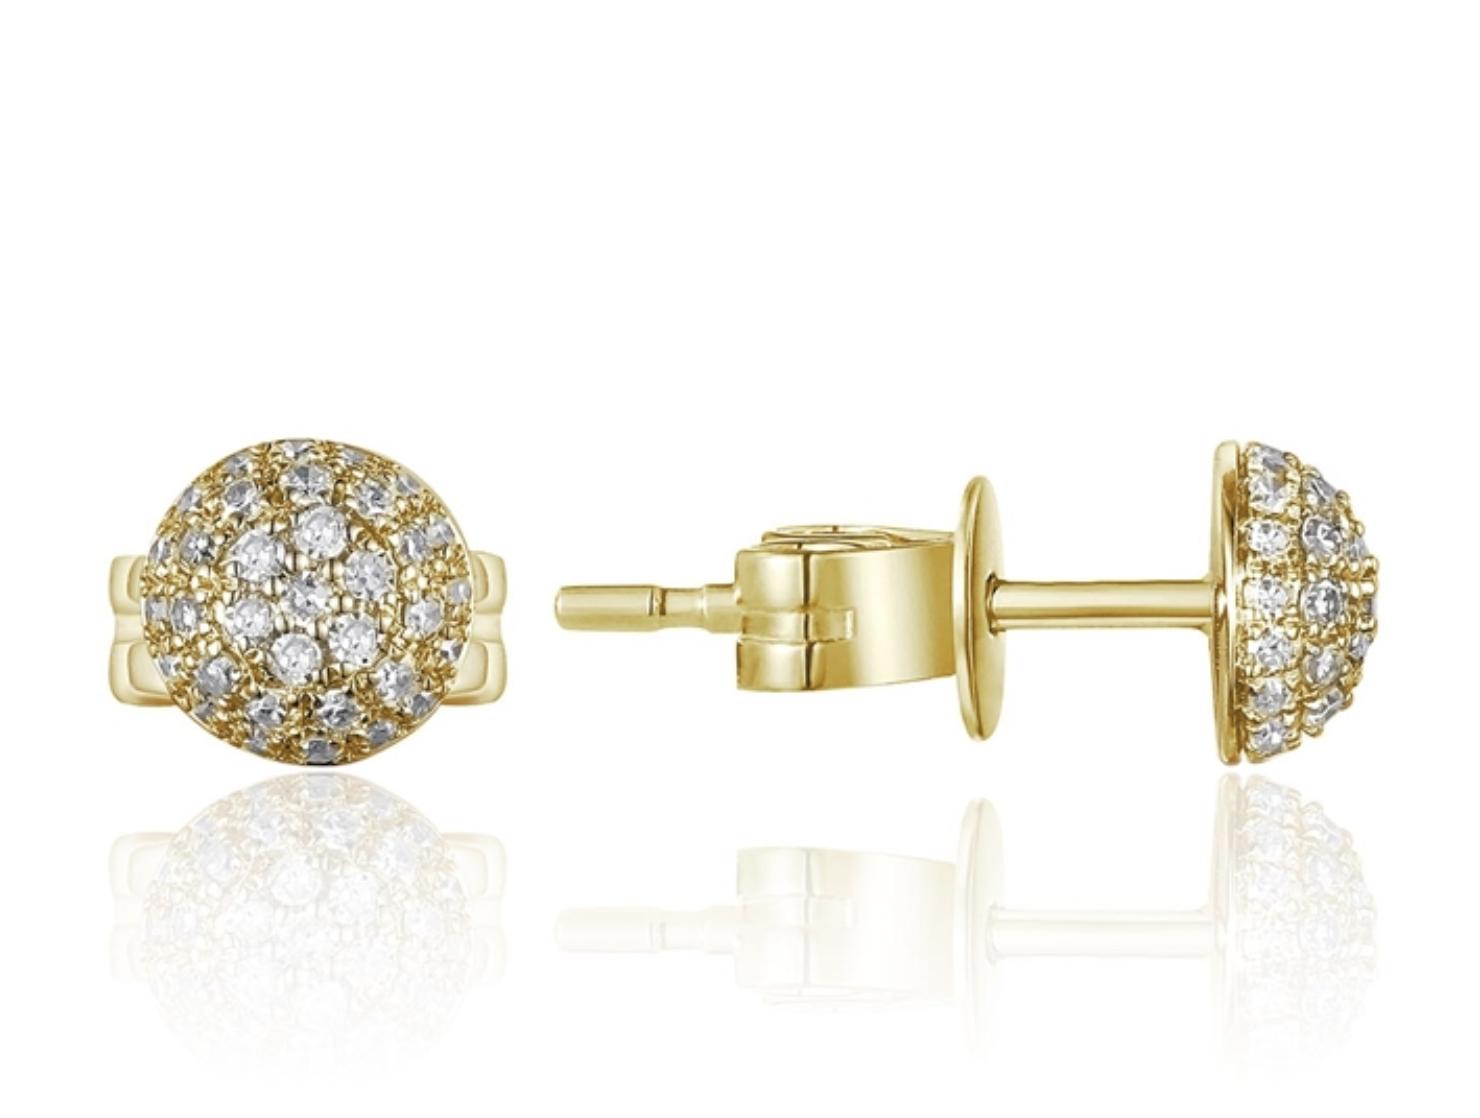 Small Pave Diamond Dome Stud Earrings LV100